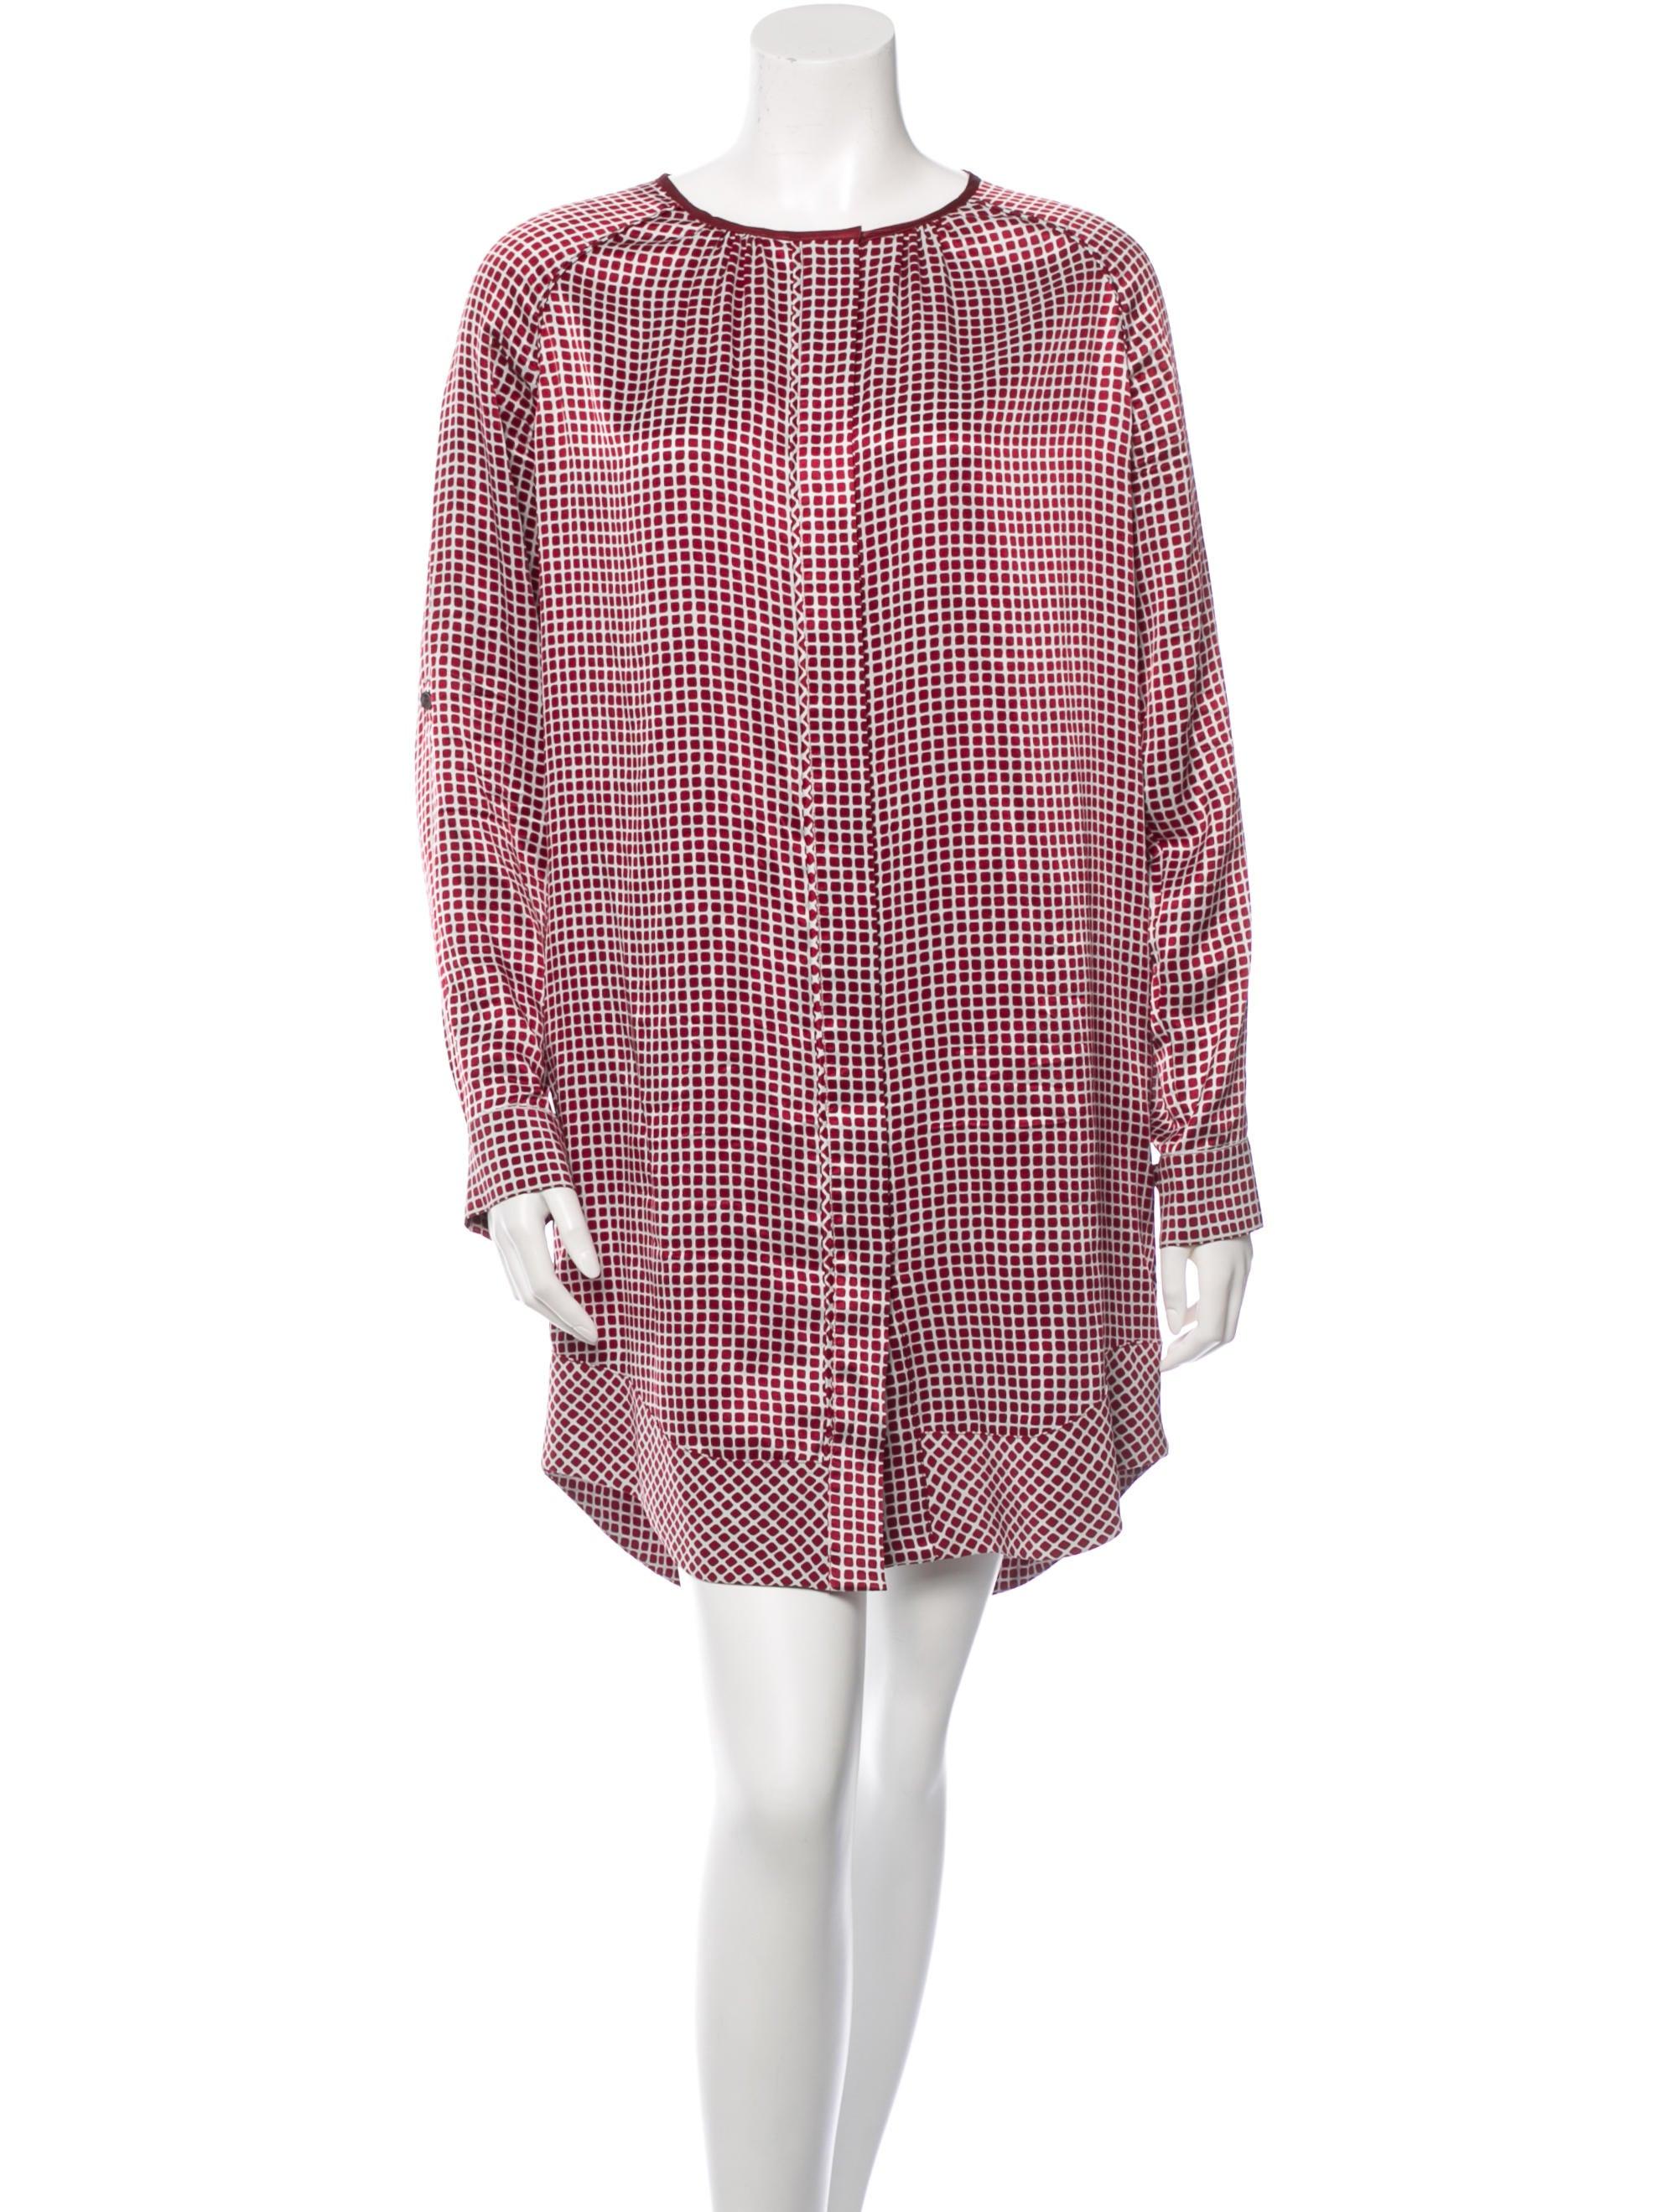 10 Crosby Derek Lam Silk Shirt Dress Clothing Wdl21749